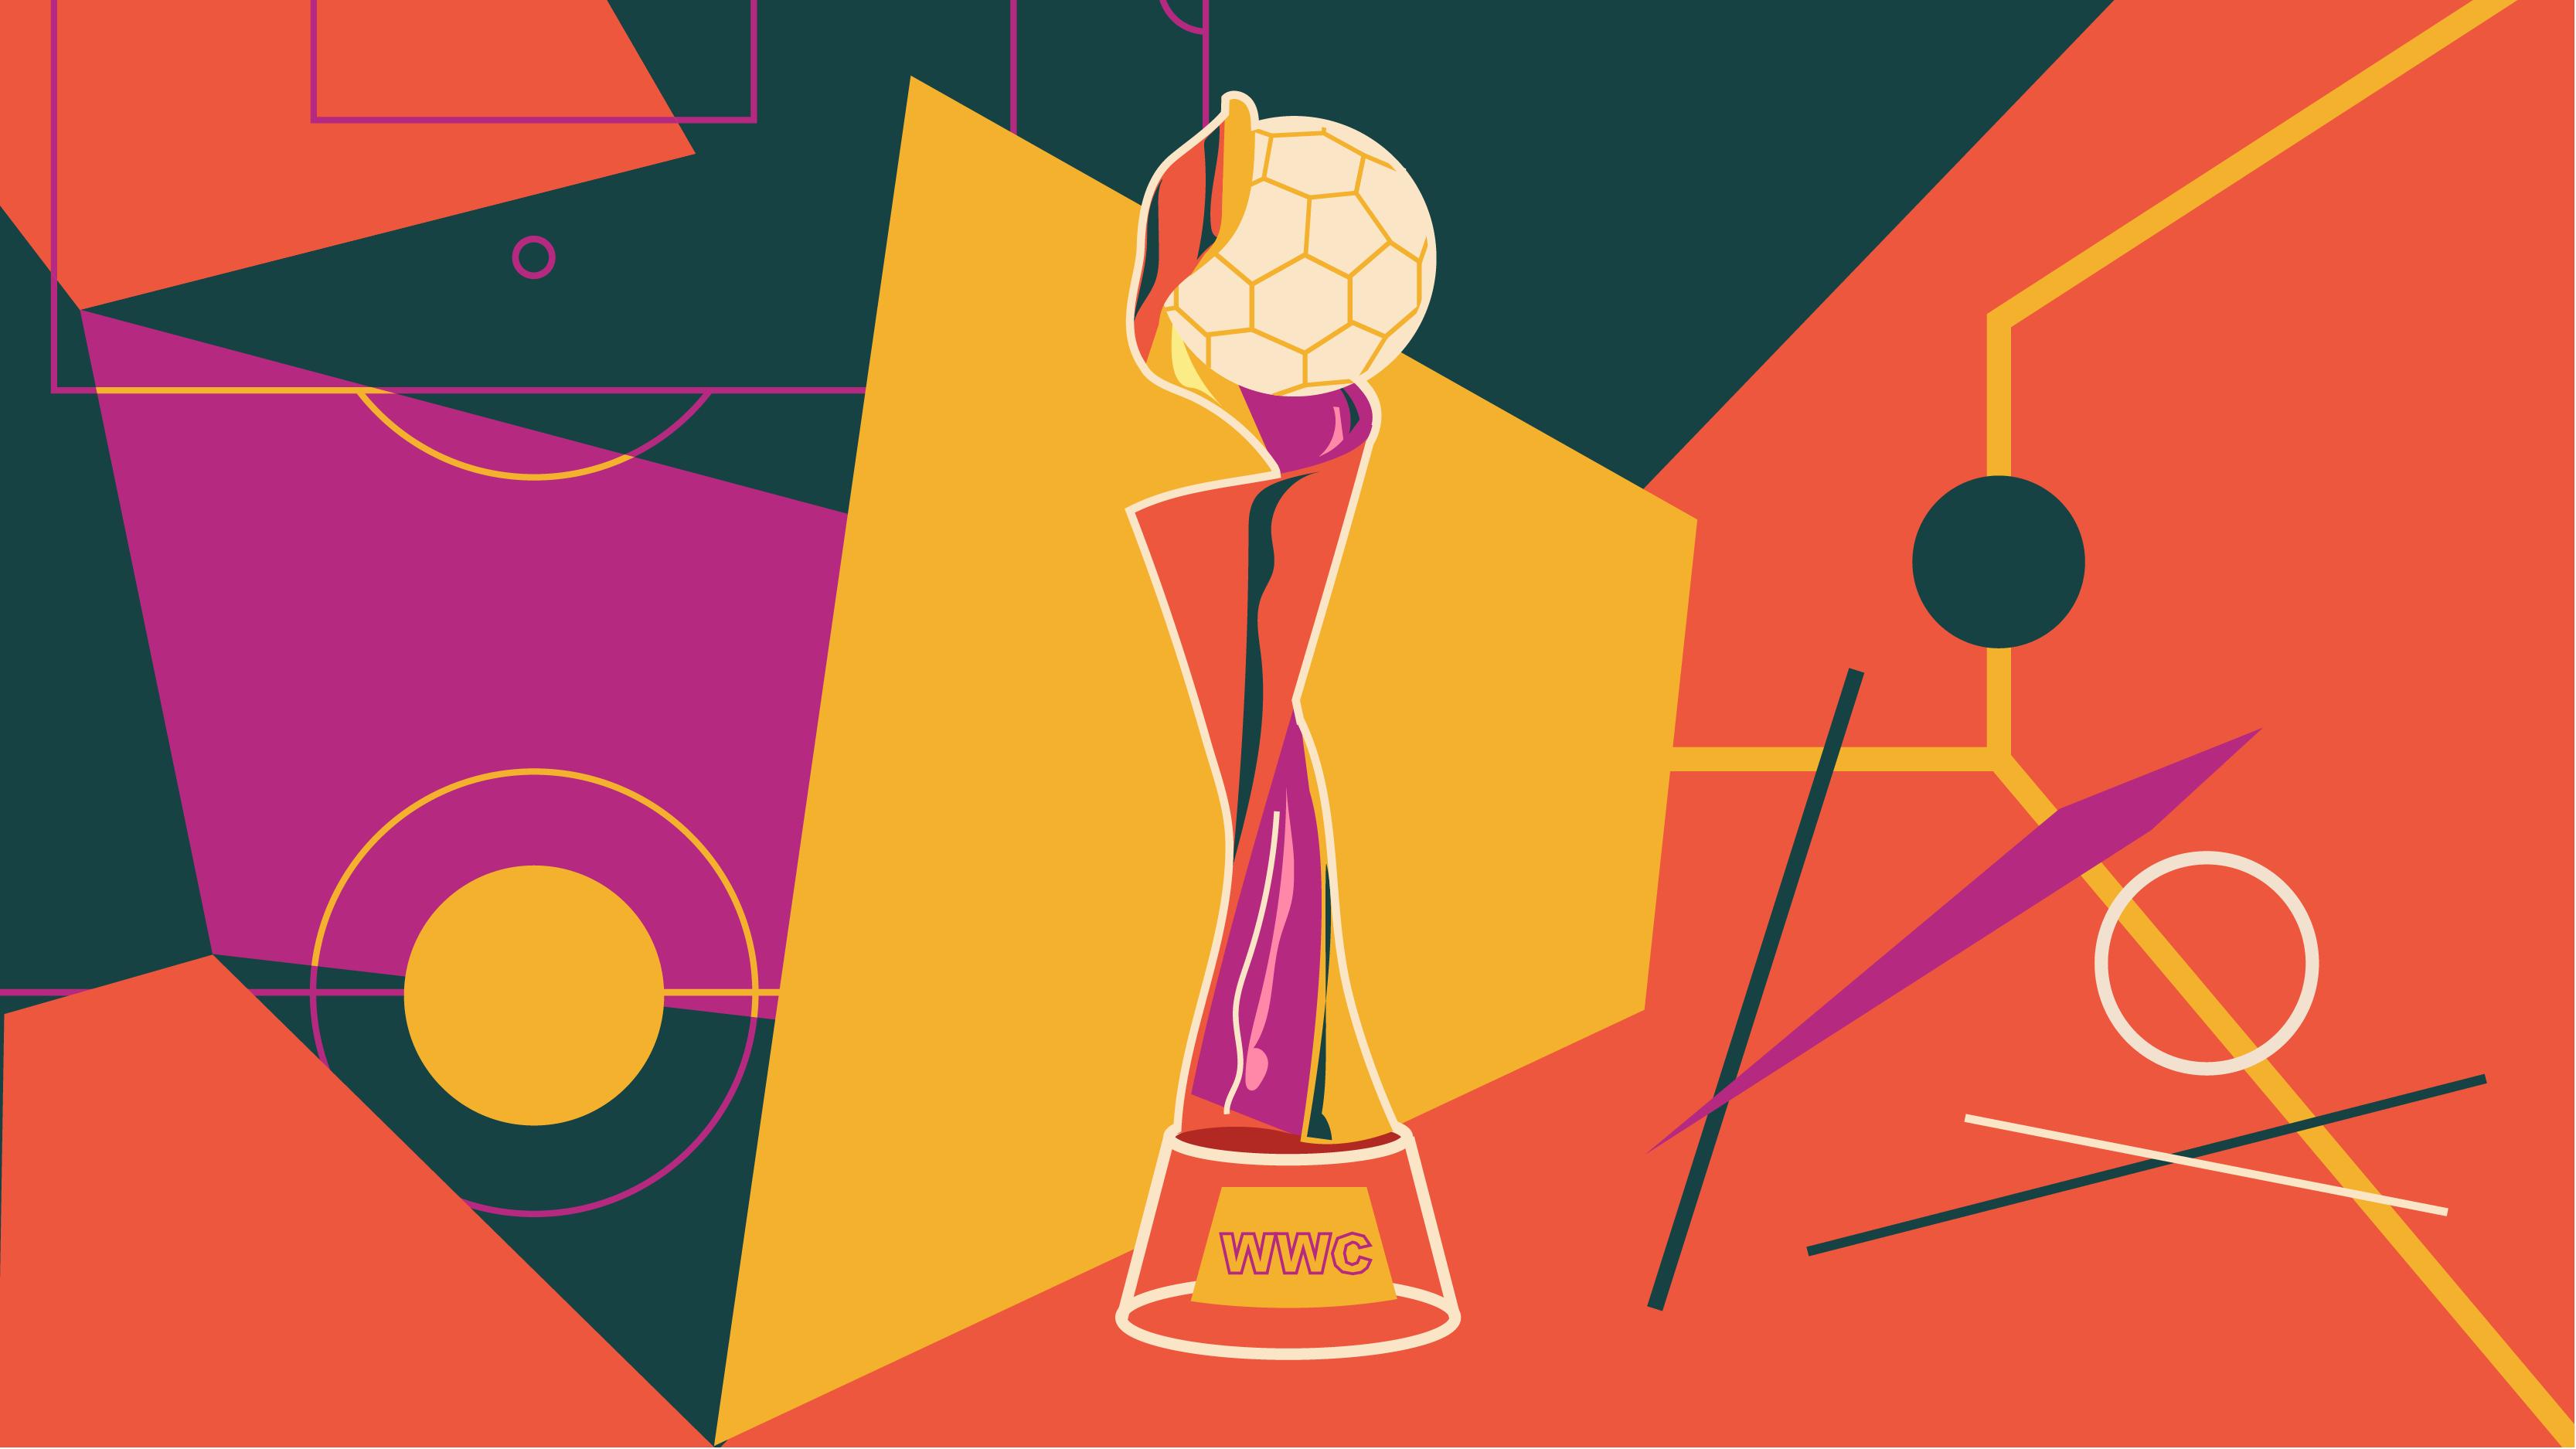 2019 Women's World Cup Predictions | FiveThirtyEight